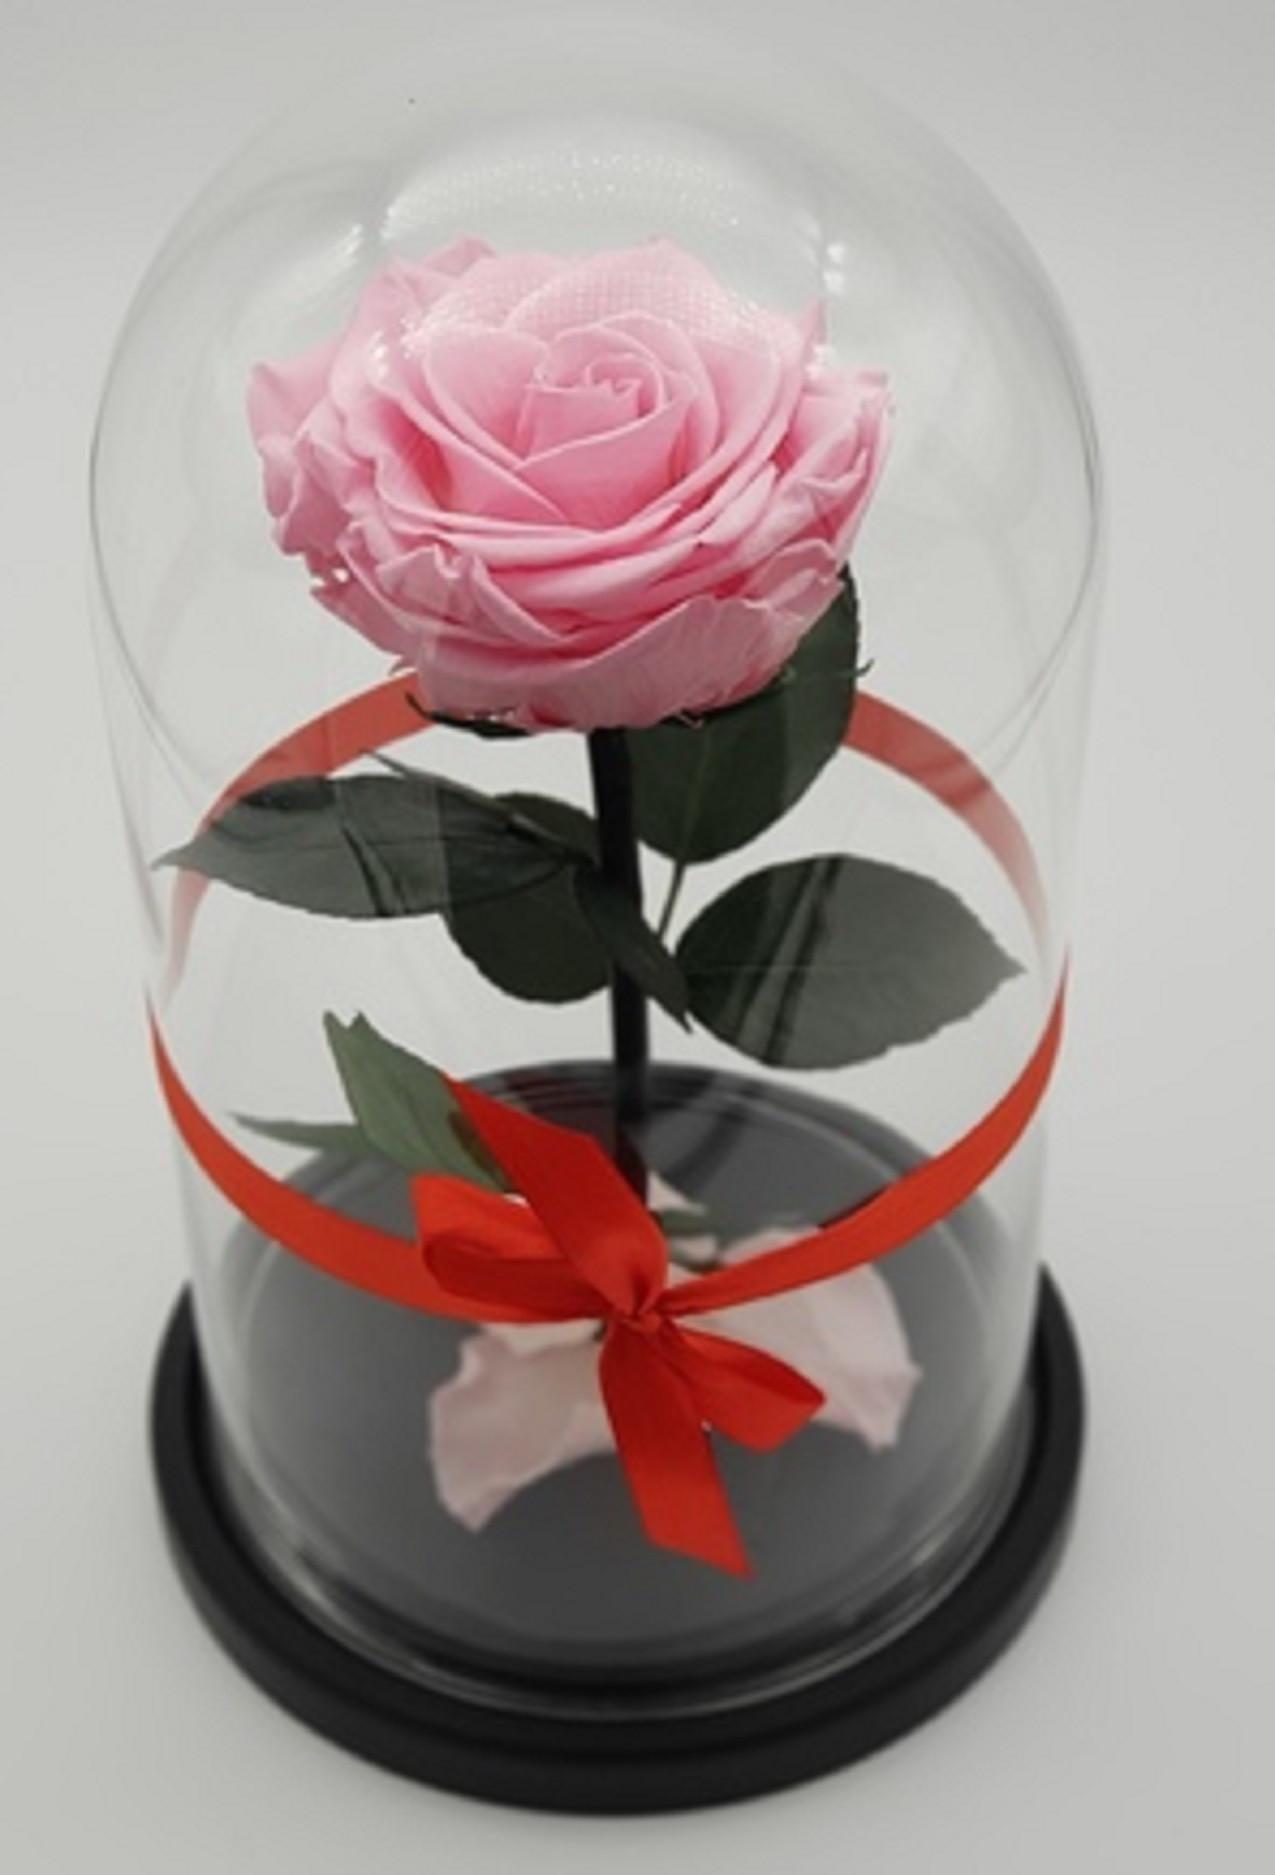 Роза в колбе мини Розовая 22*12,5*6 см